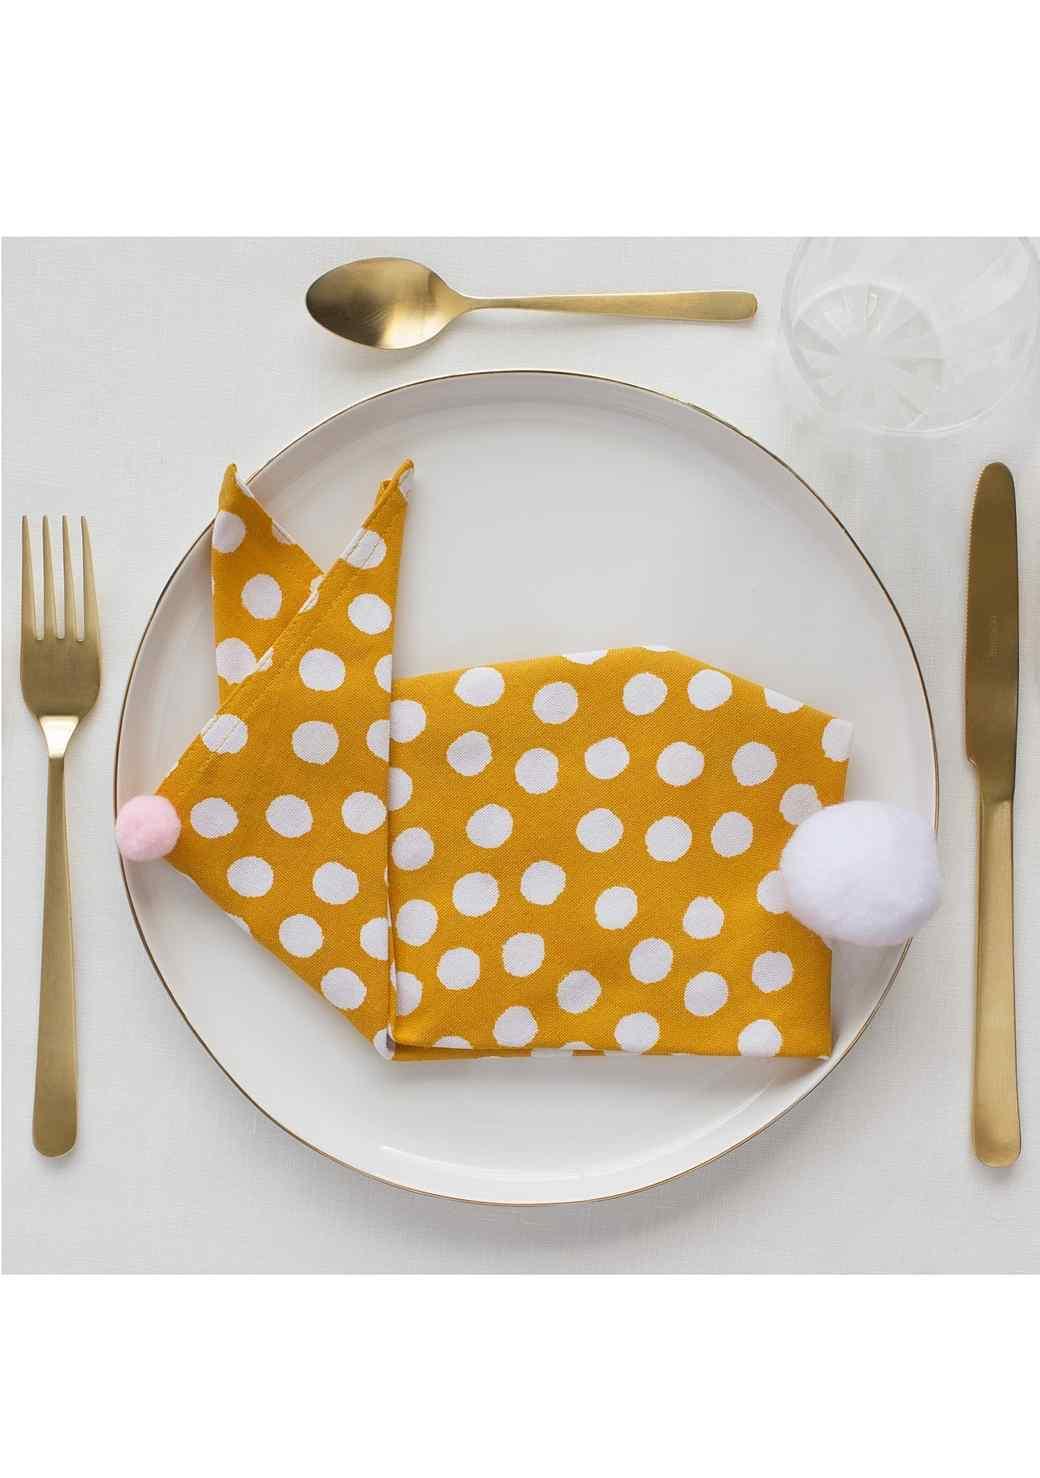 How to Fold a Napkin Into a Bunny